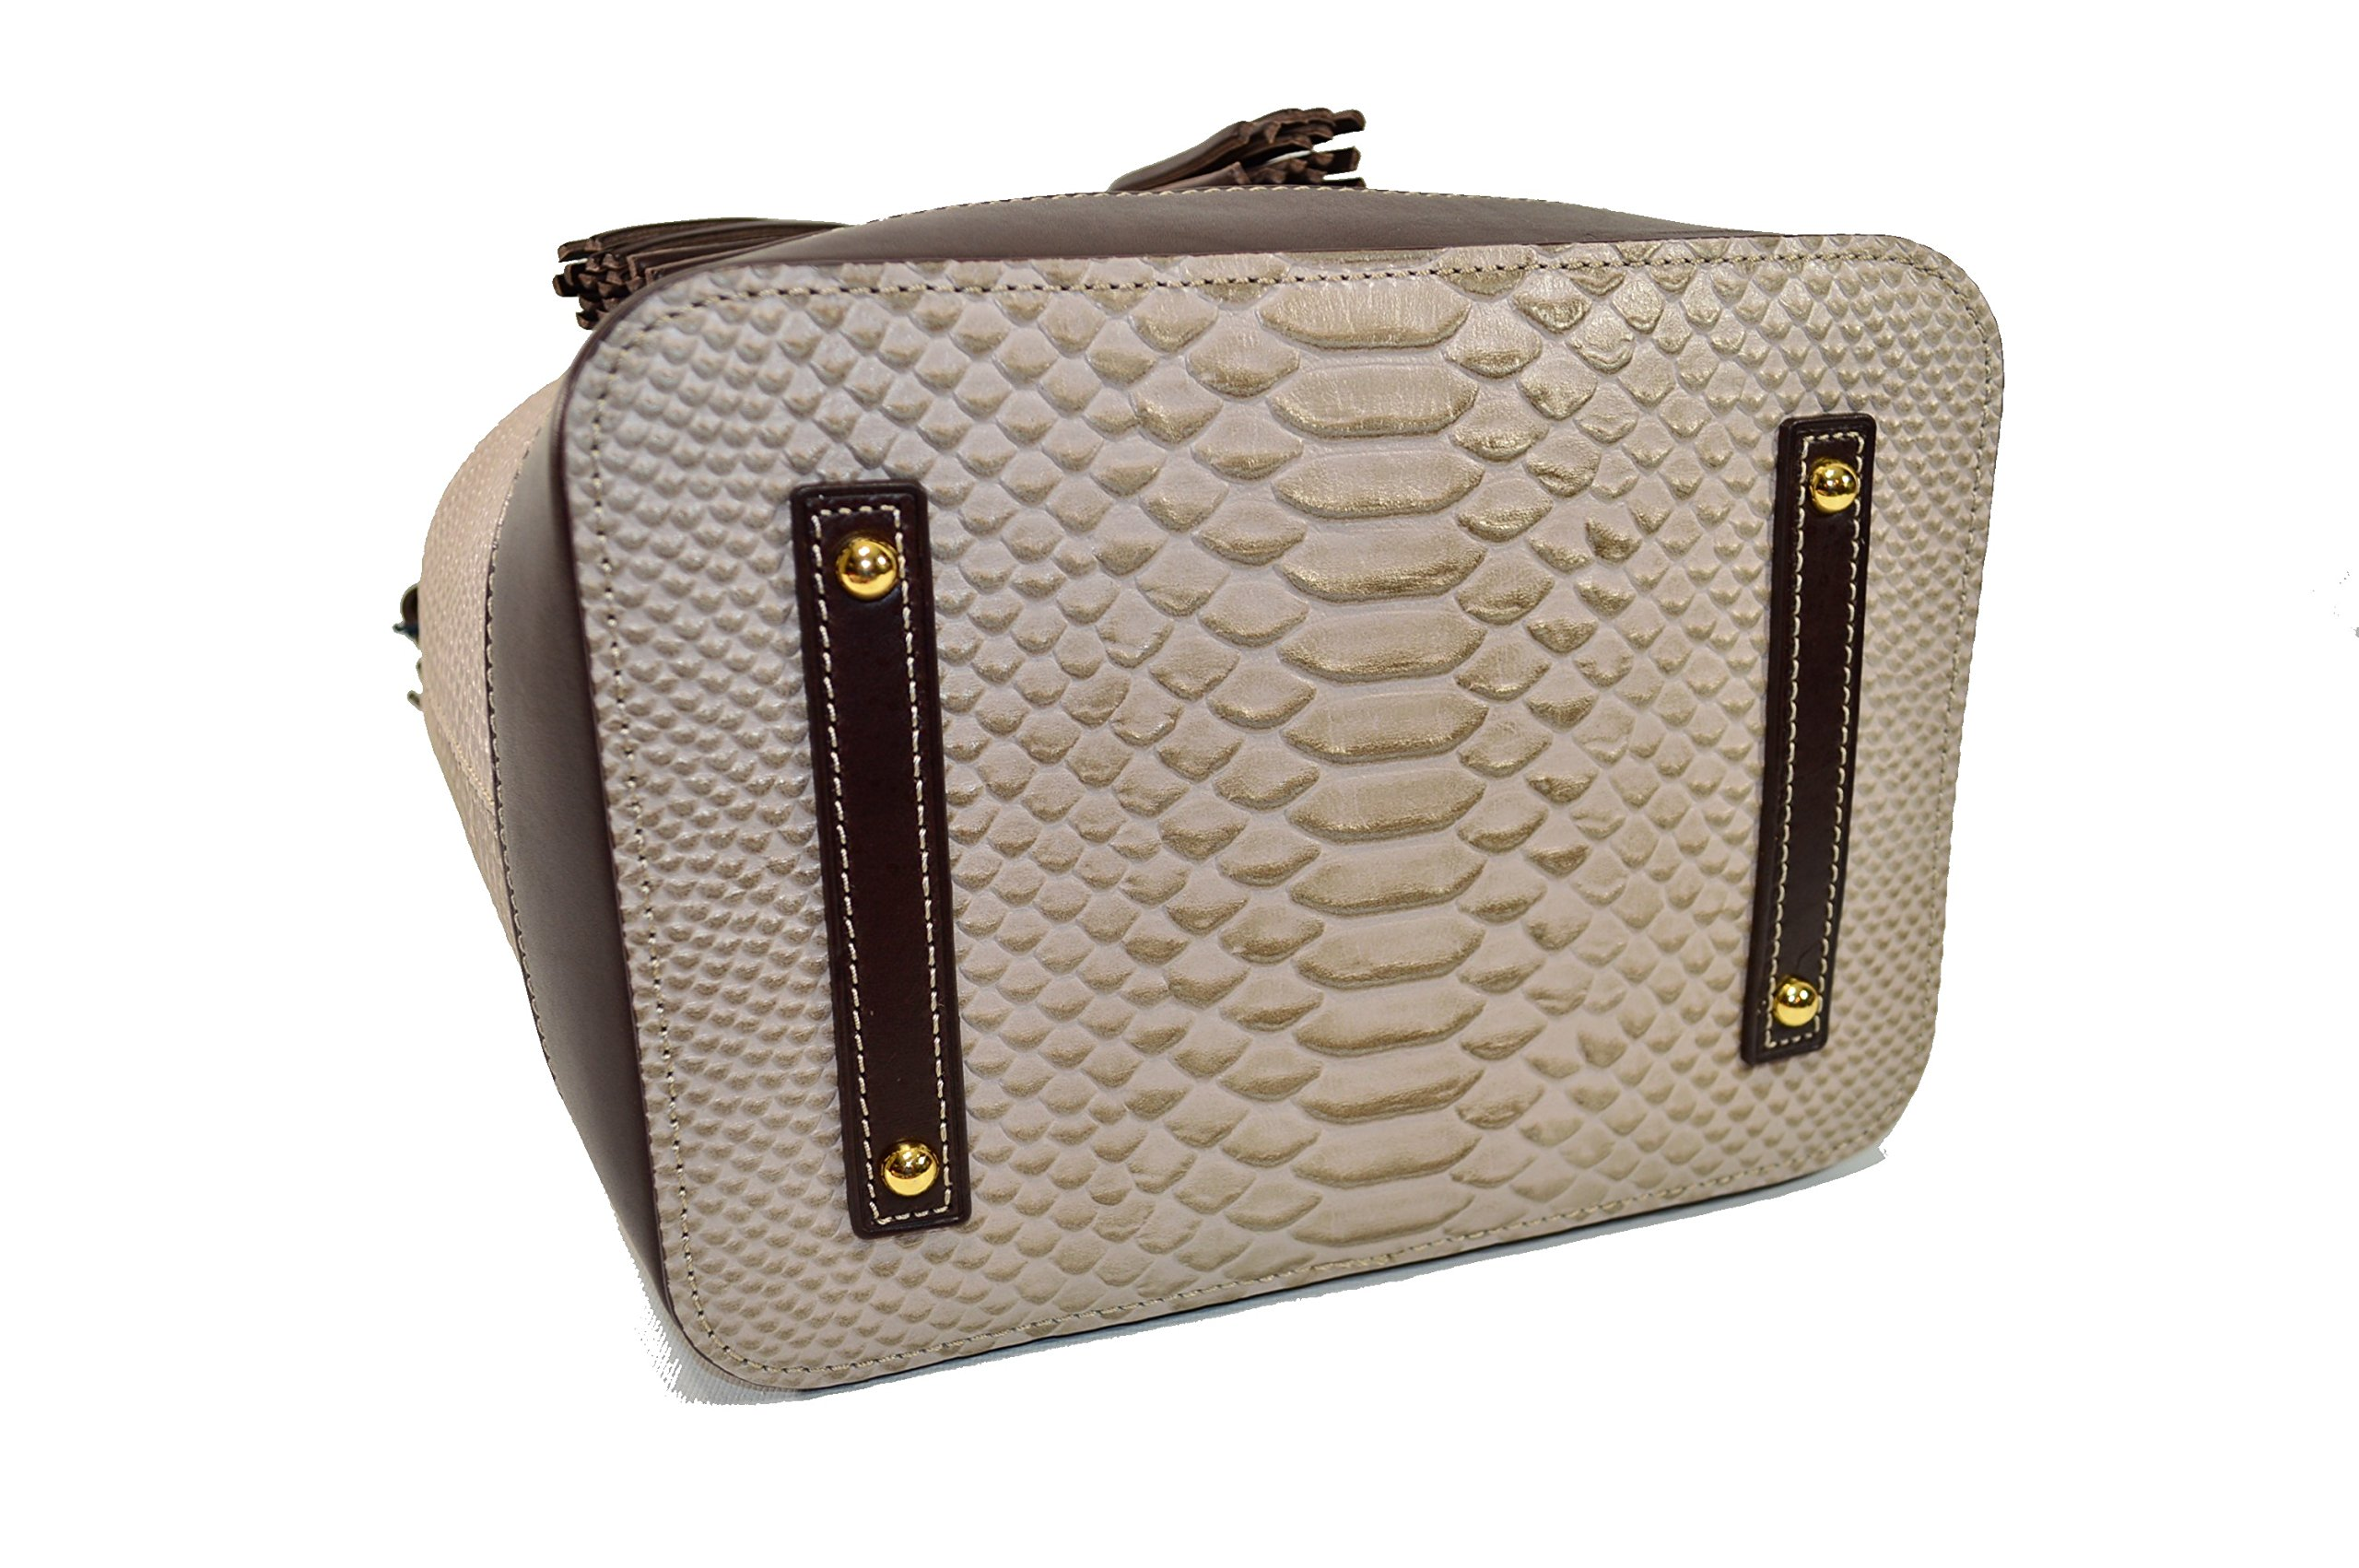 Dooney & Bourke Cordova Leather Drawstring Bag BCALD9038 Taupe by Dooney & Bourke (Image #4)